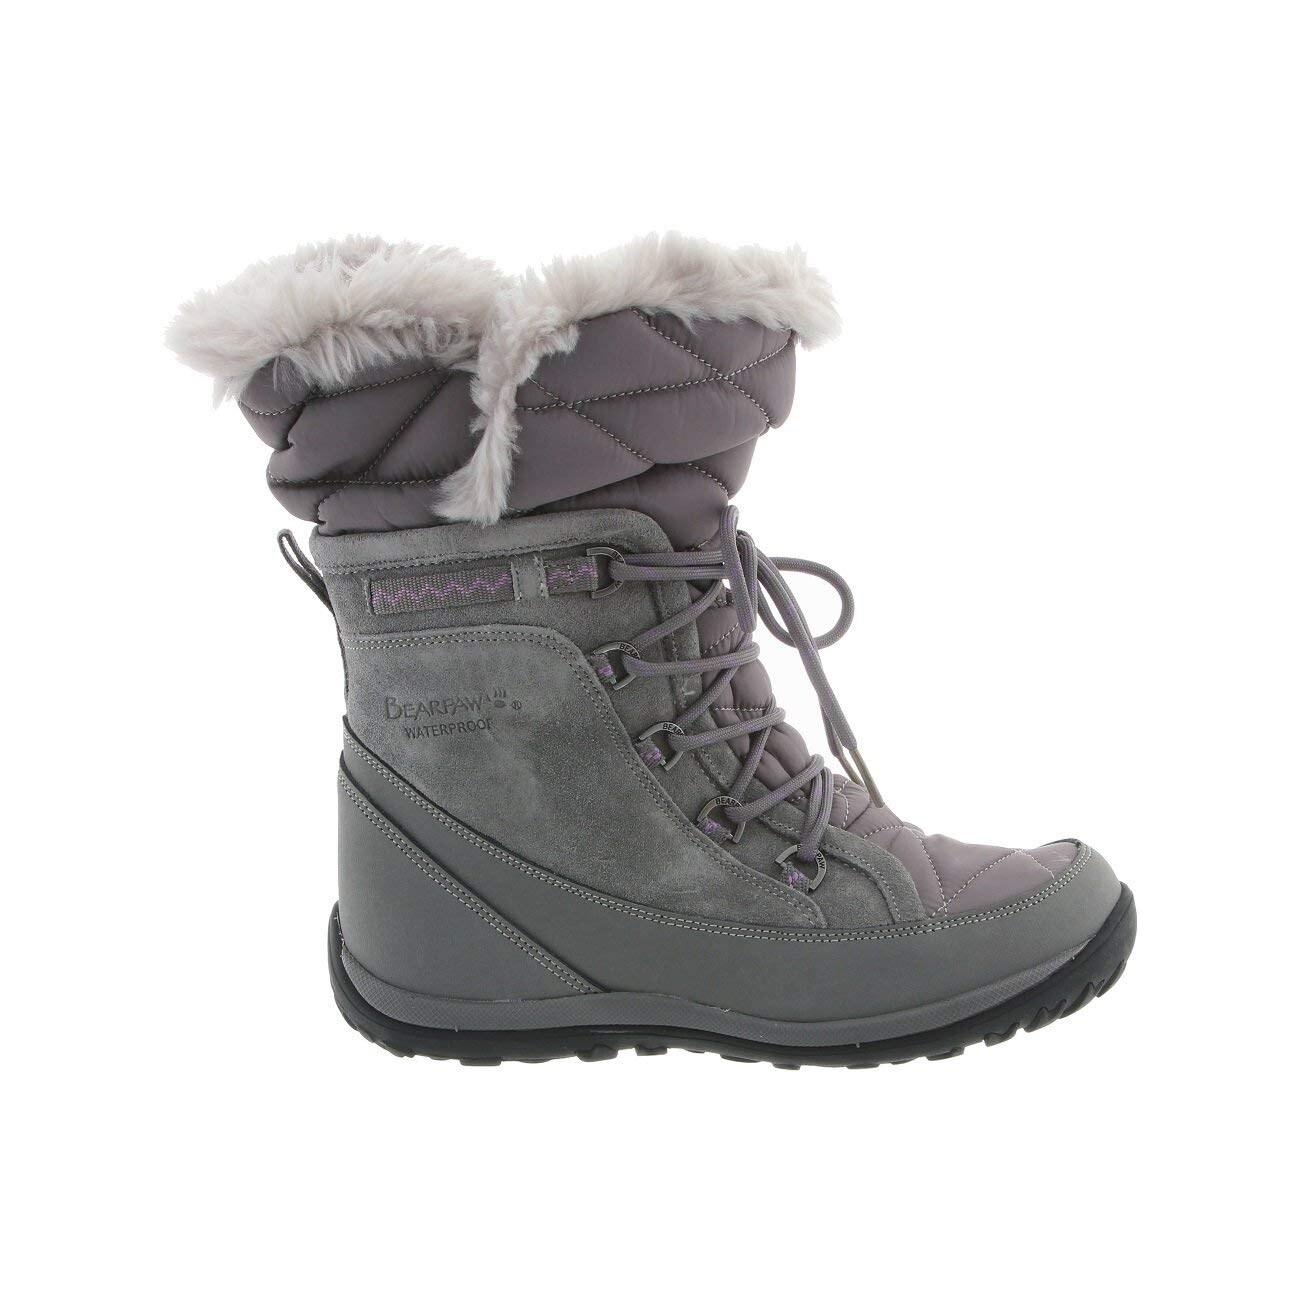 Shop Bearpaw Damenschuhe Calf whitney Closed Toe Mid Calf Damenschuhe Cold Weather Stiefel ... 8d3ecb